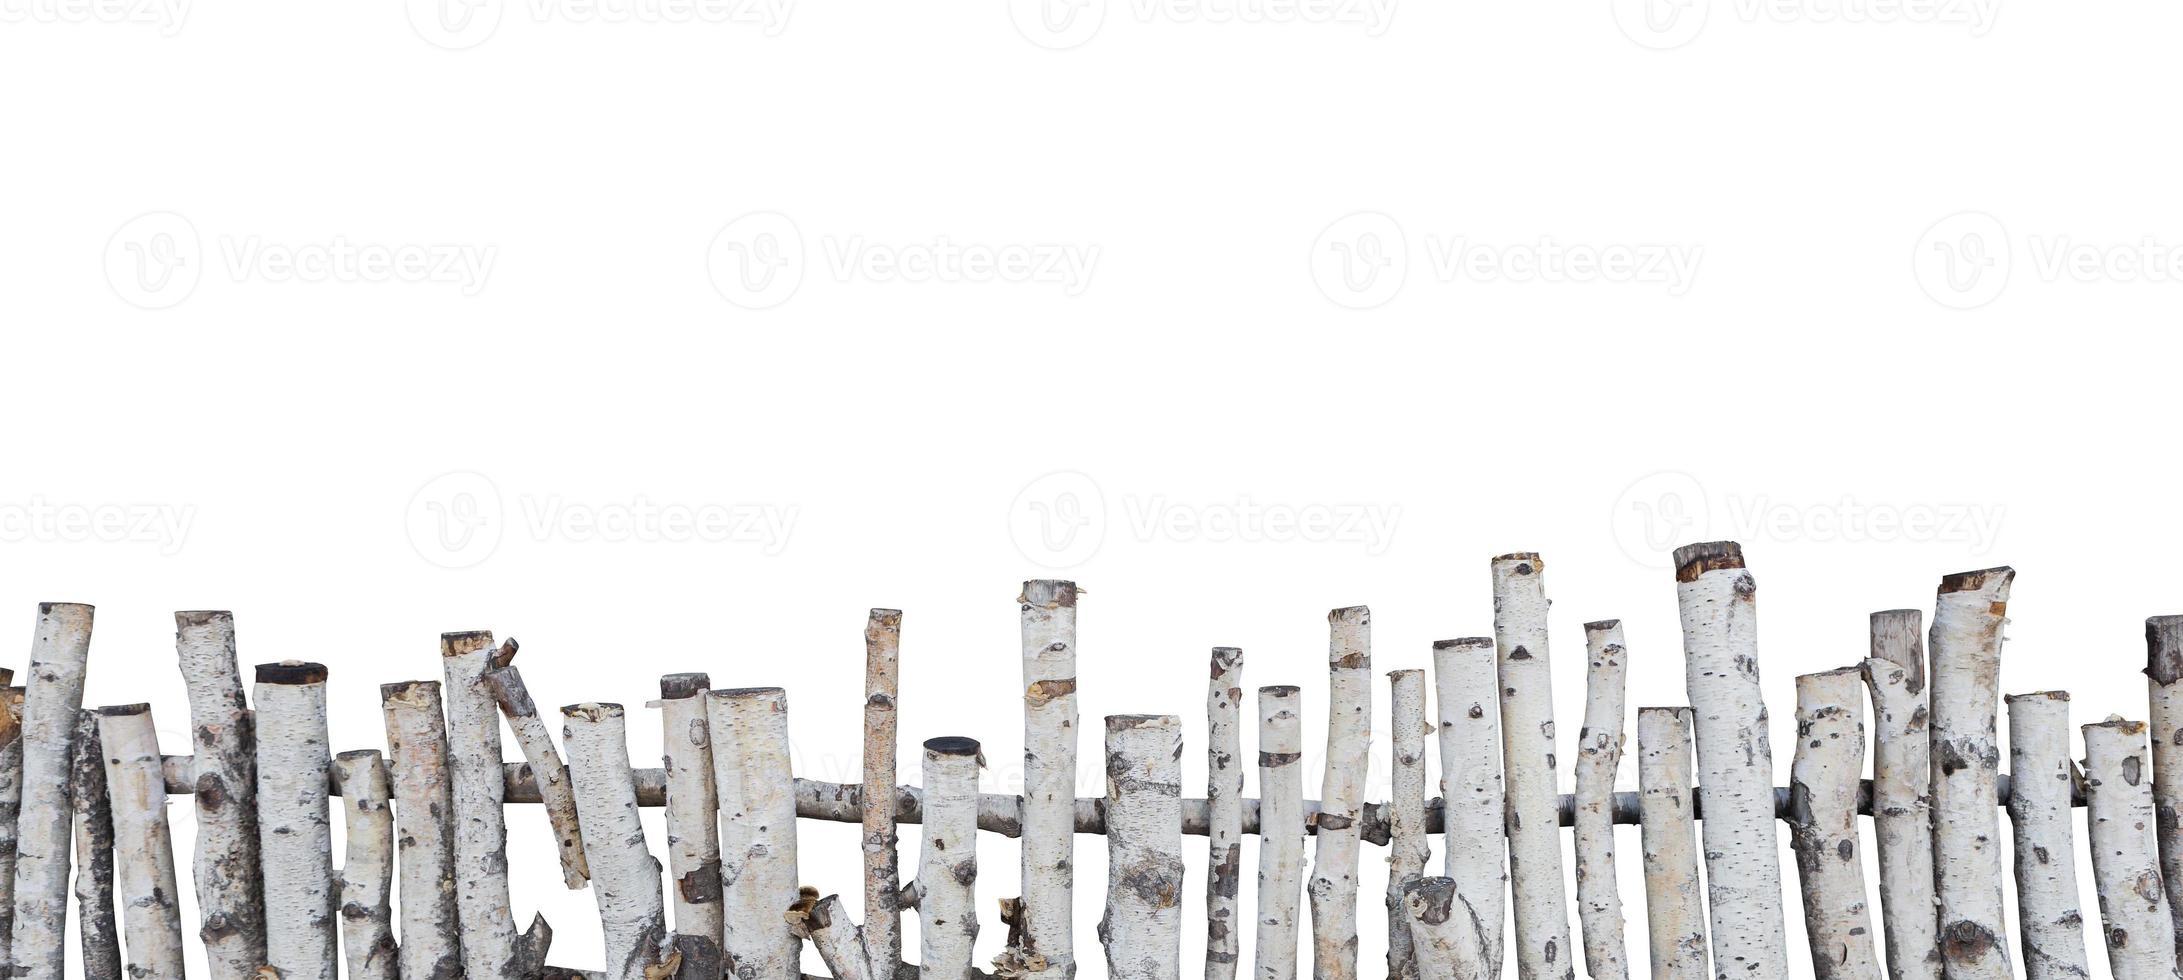 alter Holzzaun foto